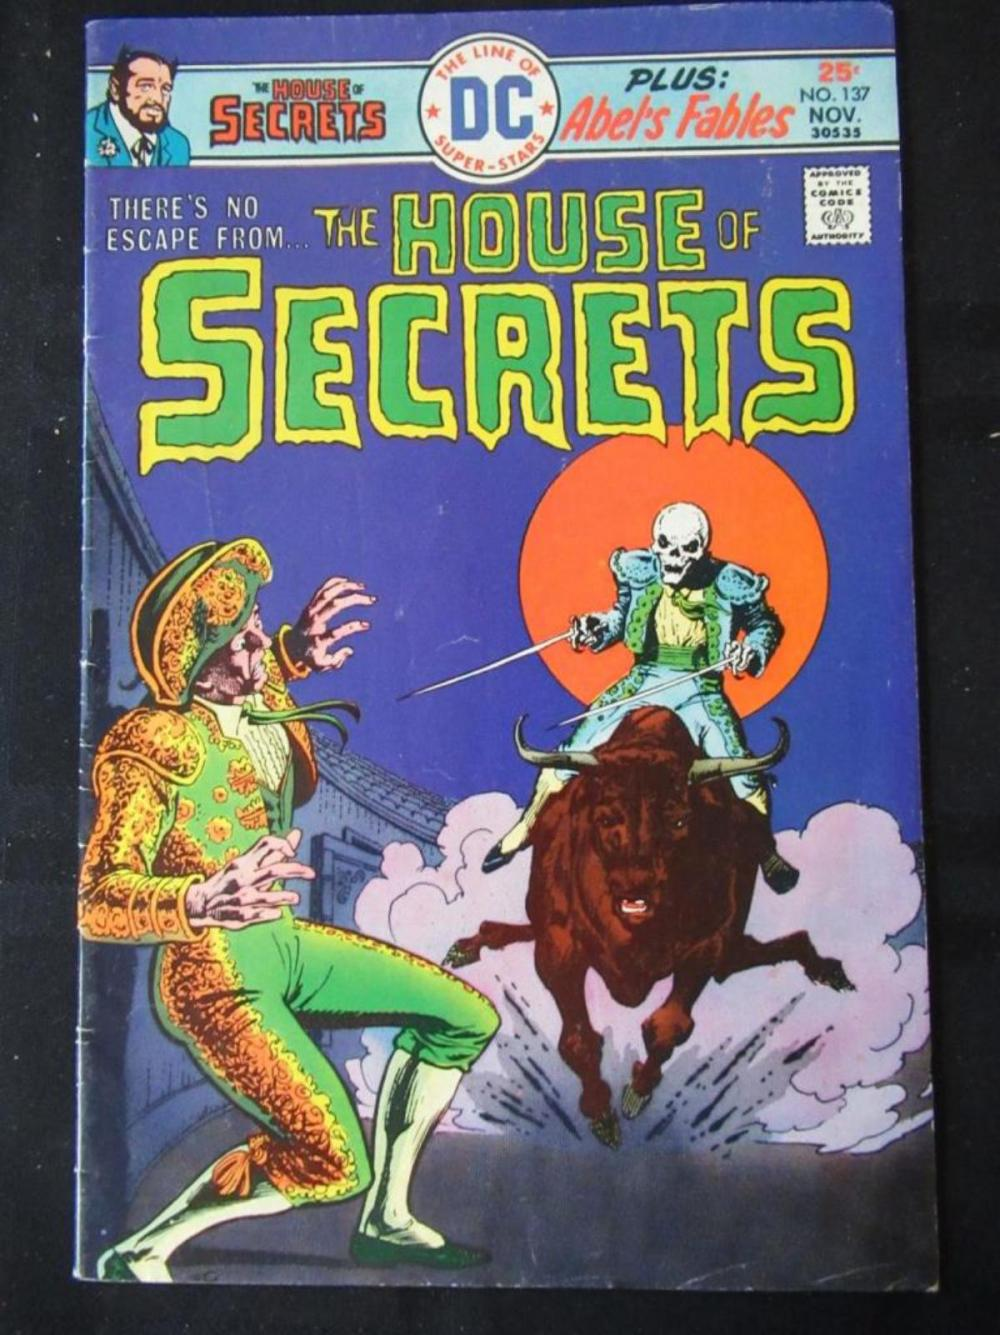 Lot 249: The House of Secrets 25c #137